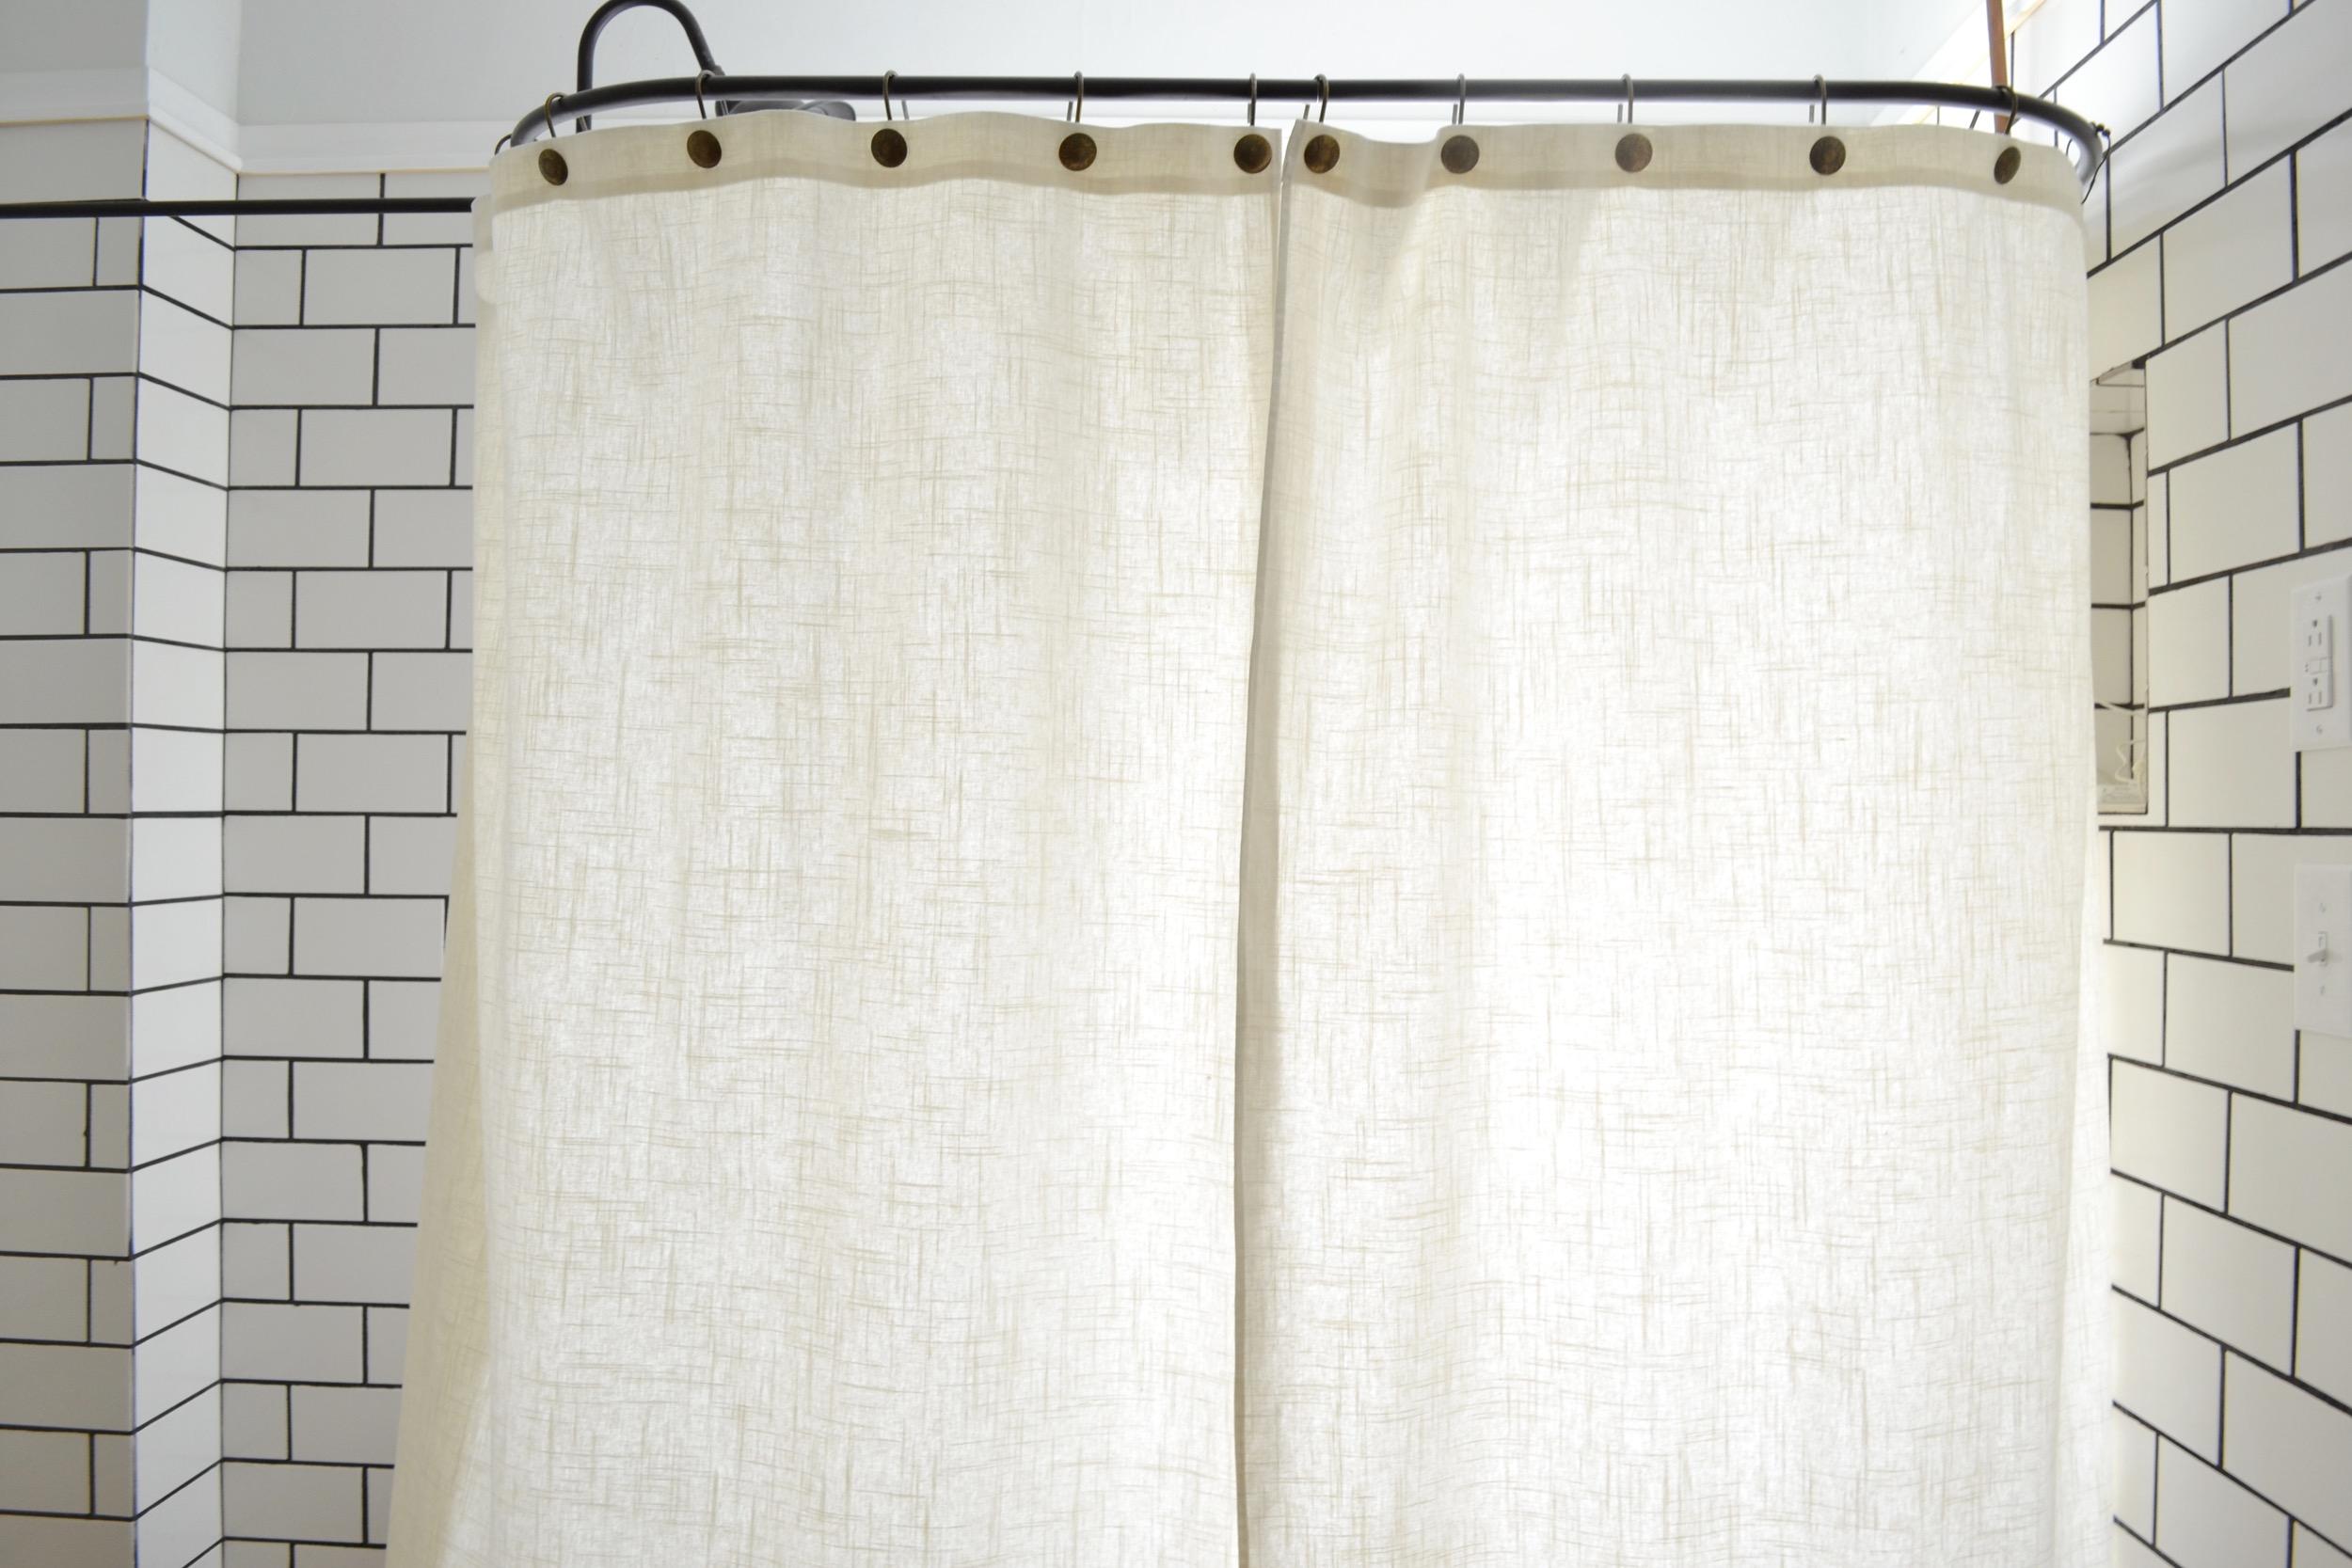 A Diy Clawfoot Tub Shower Curtain For Your Clawfoot Tub Shower